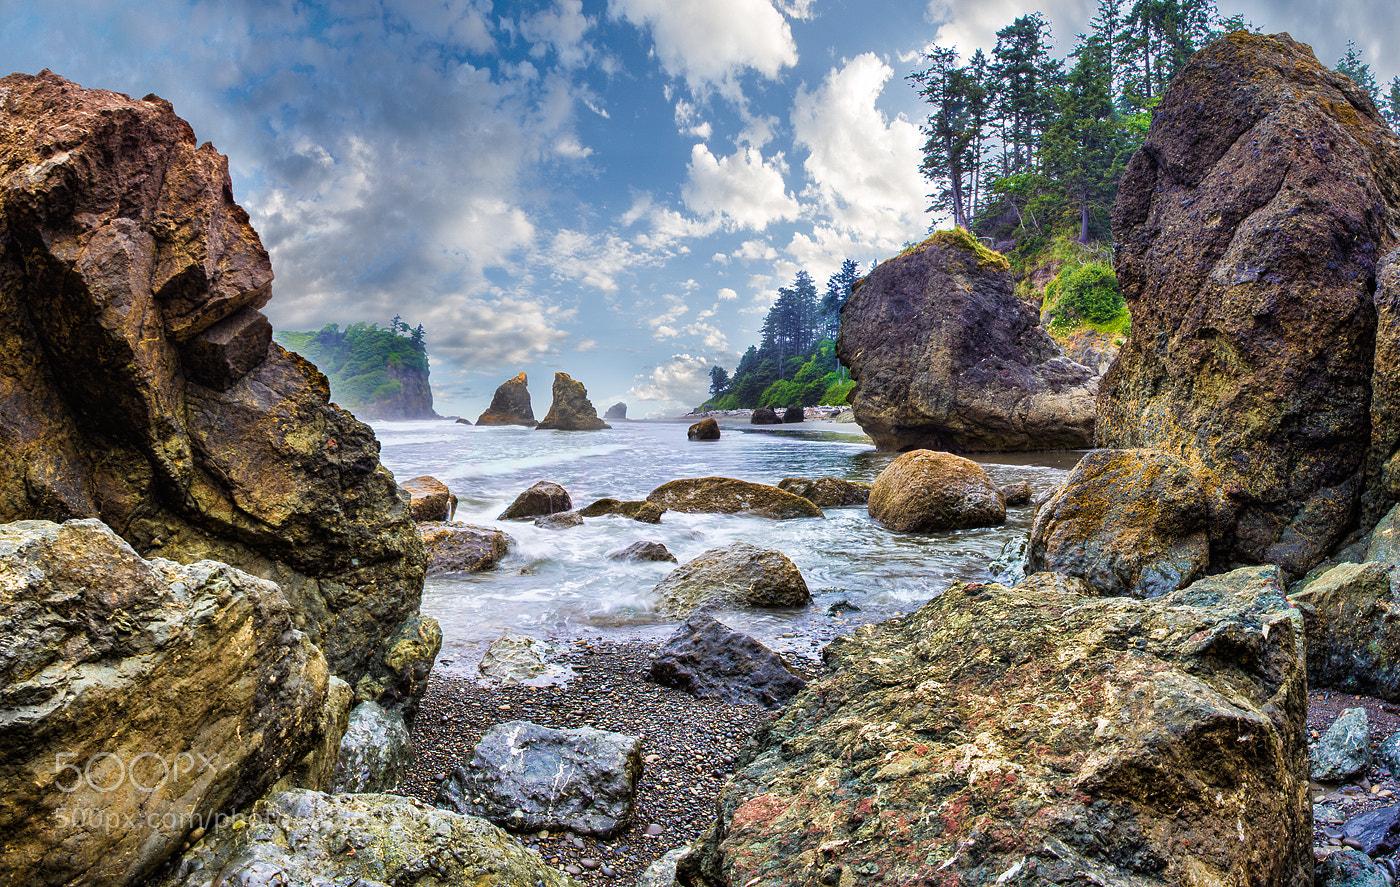 Photograph Pacific coast of USA by Alex Gubski on 500px